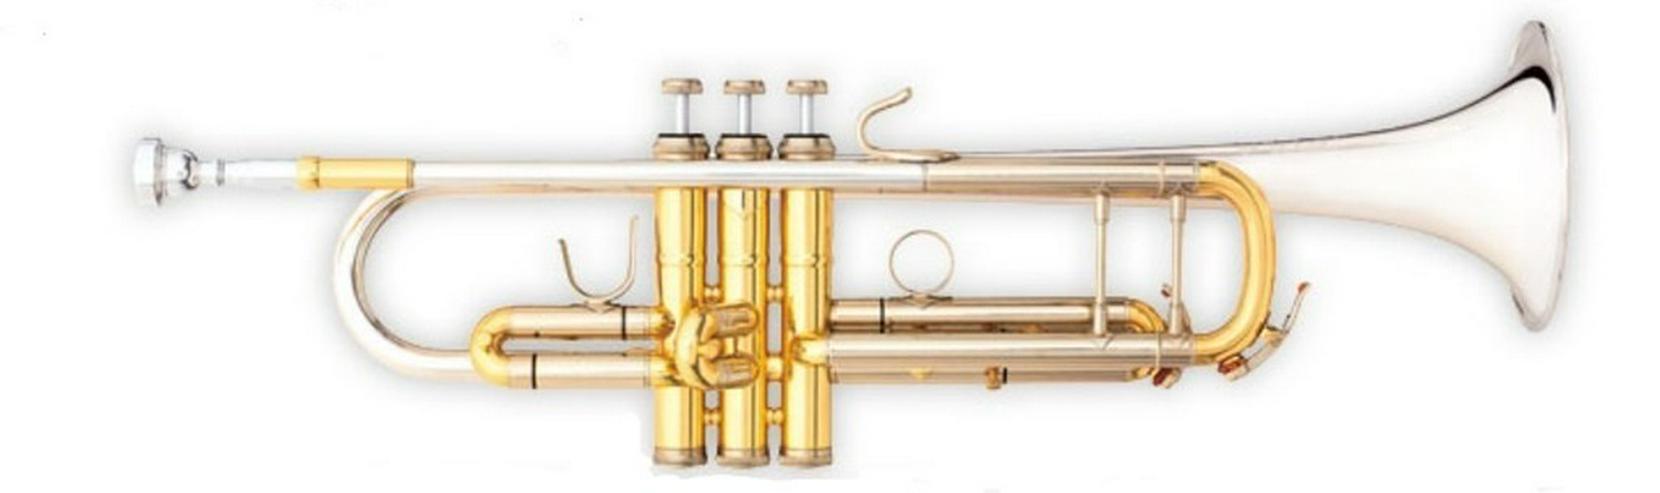 B & S Challenger Profiklasse Trompete 3137/2ST